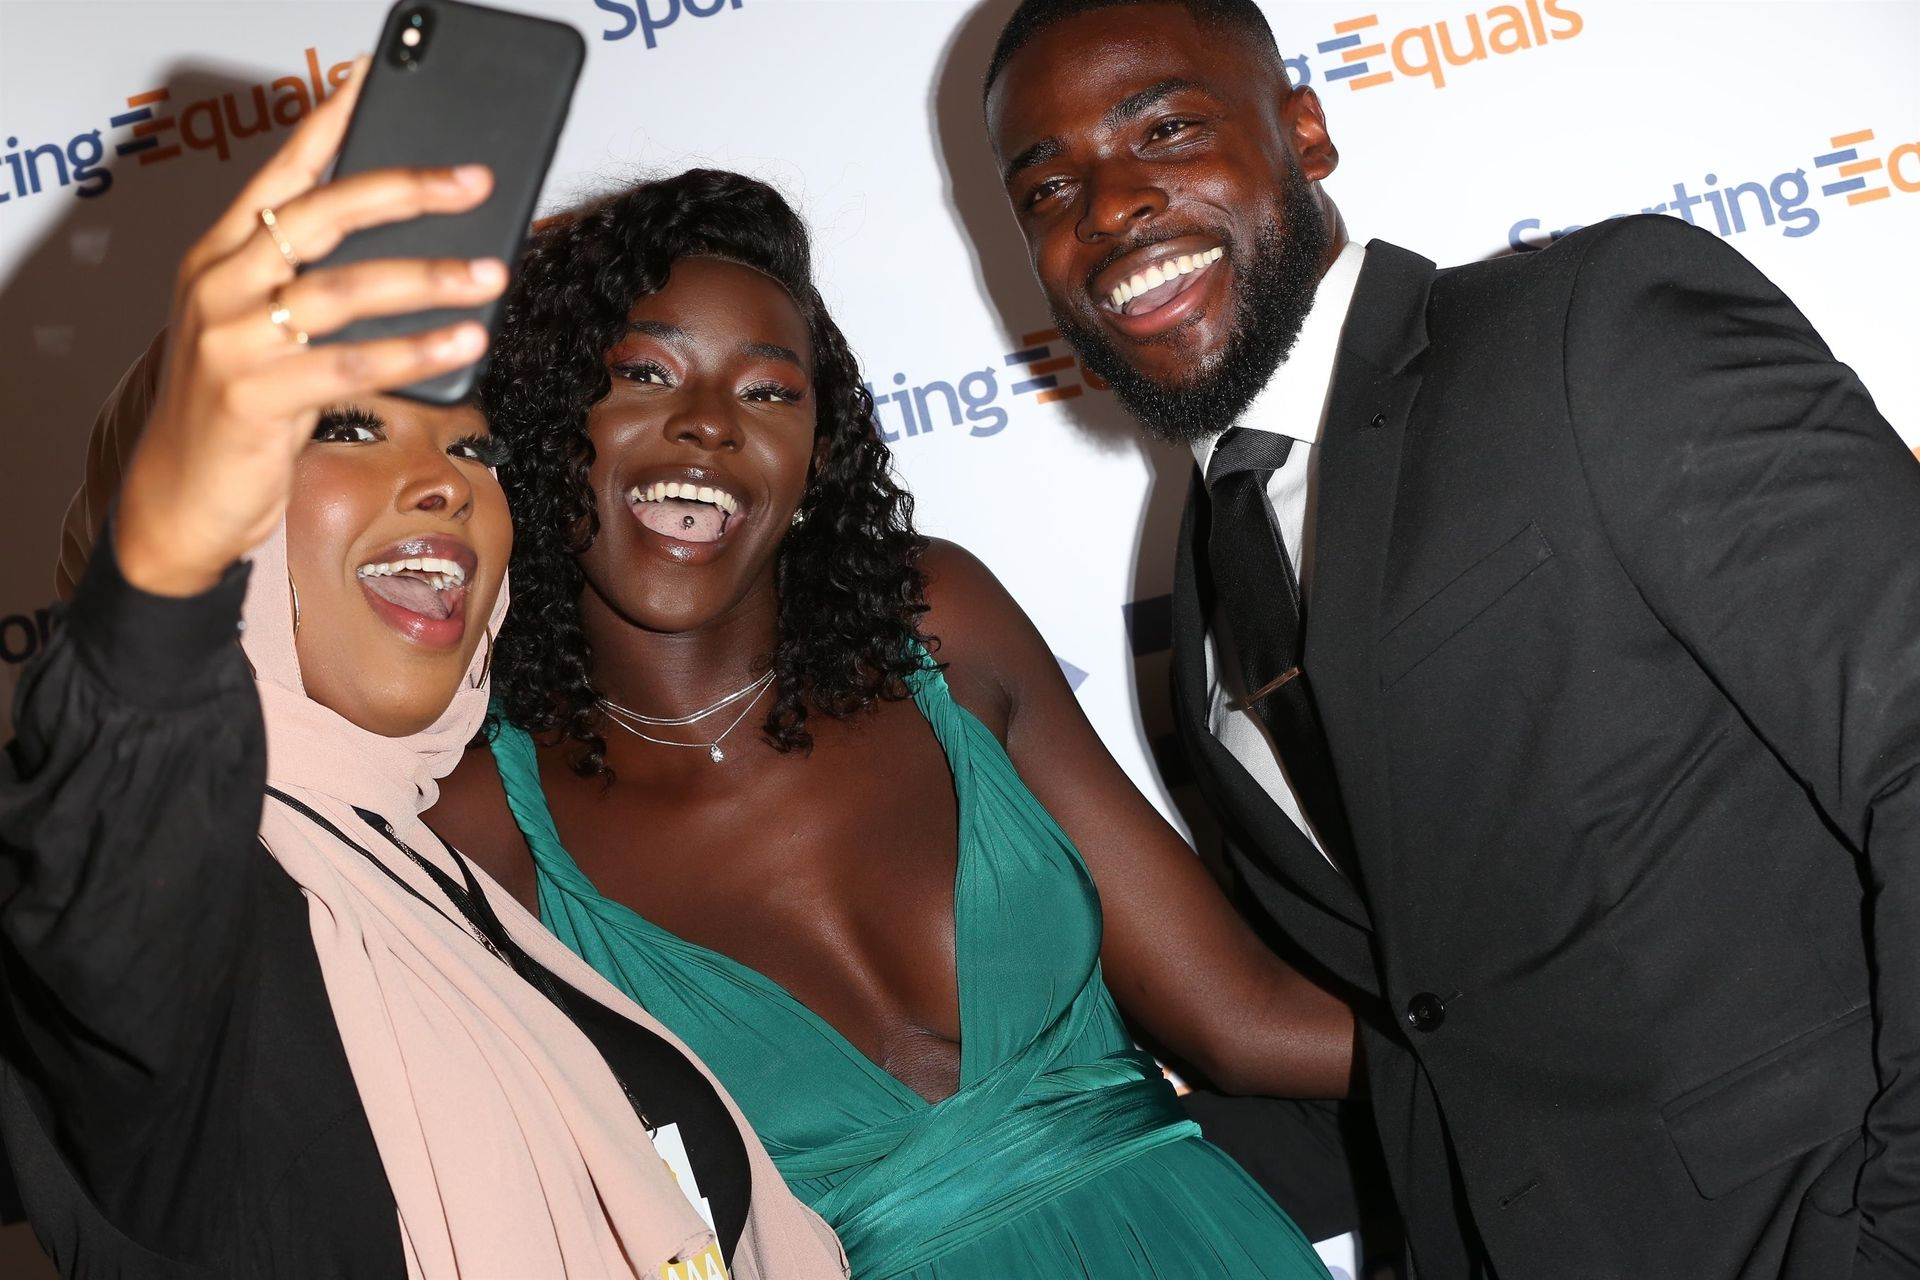 Mike Boateng & Priscilla Anyabu Are Seen At British Ethnic Diversity Sports Awards 0085